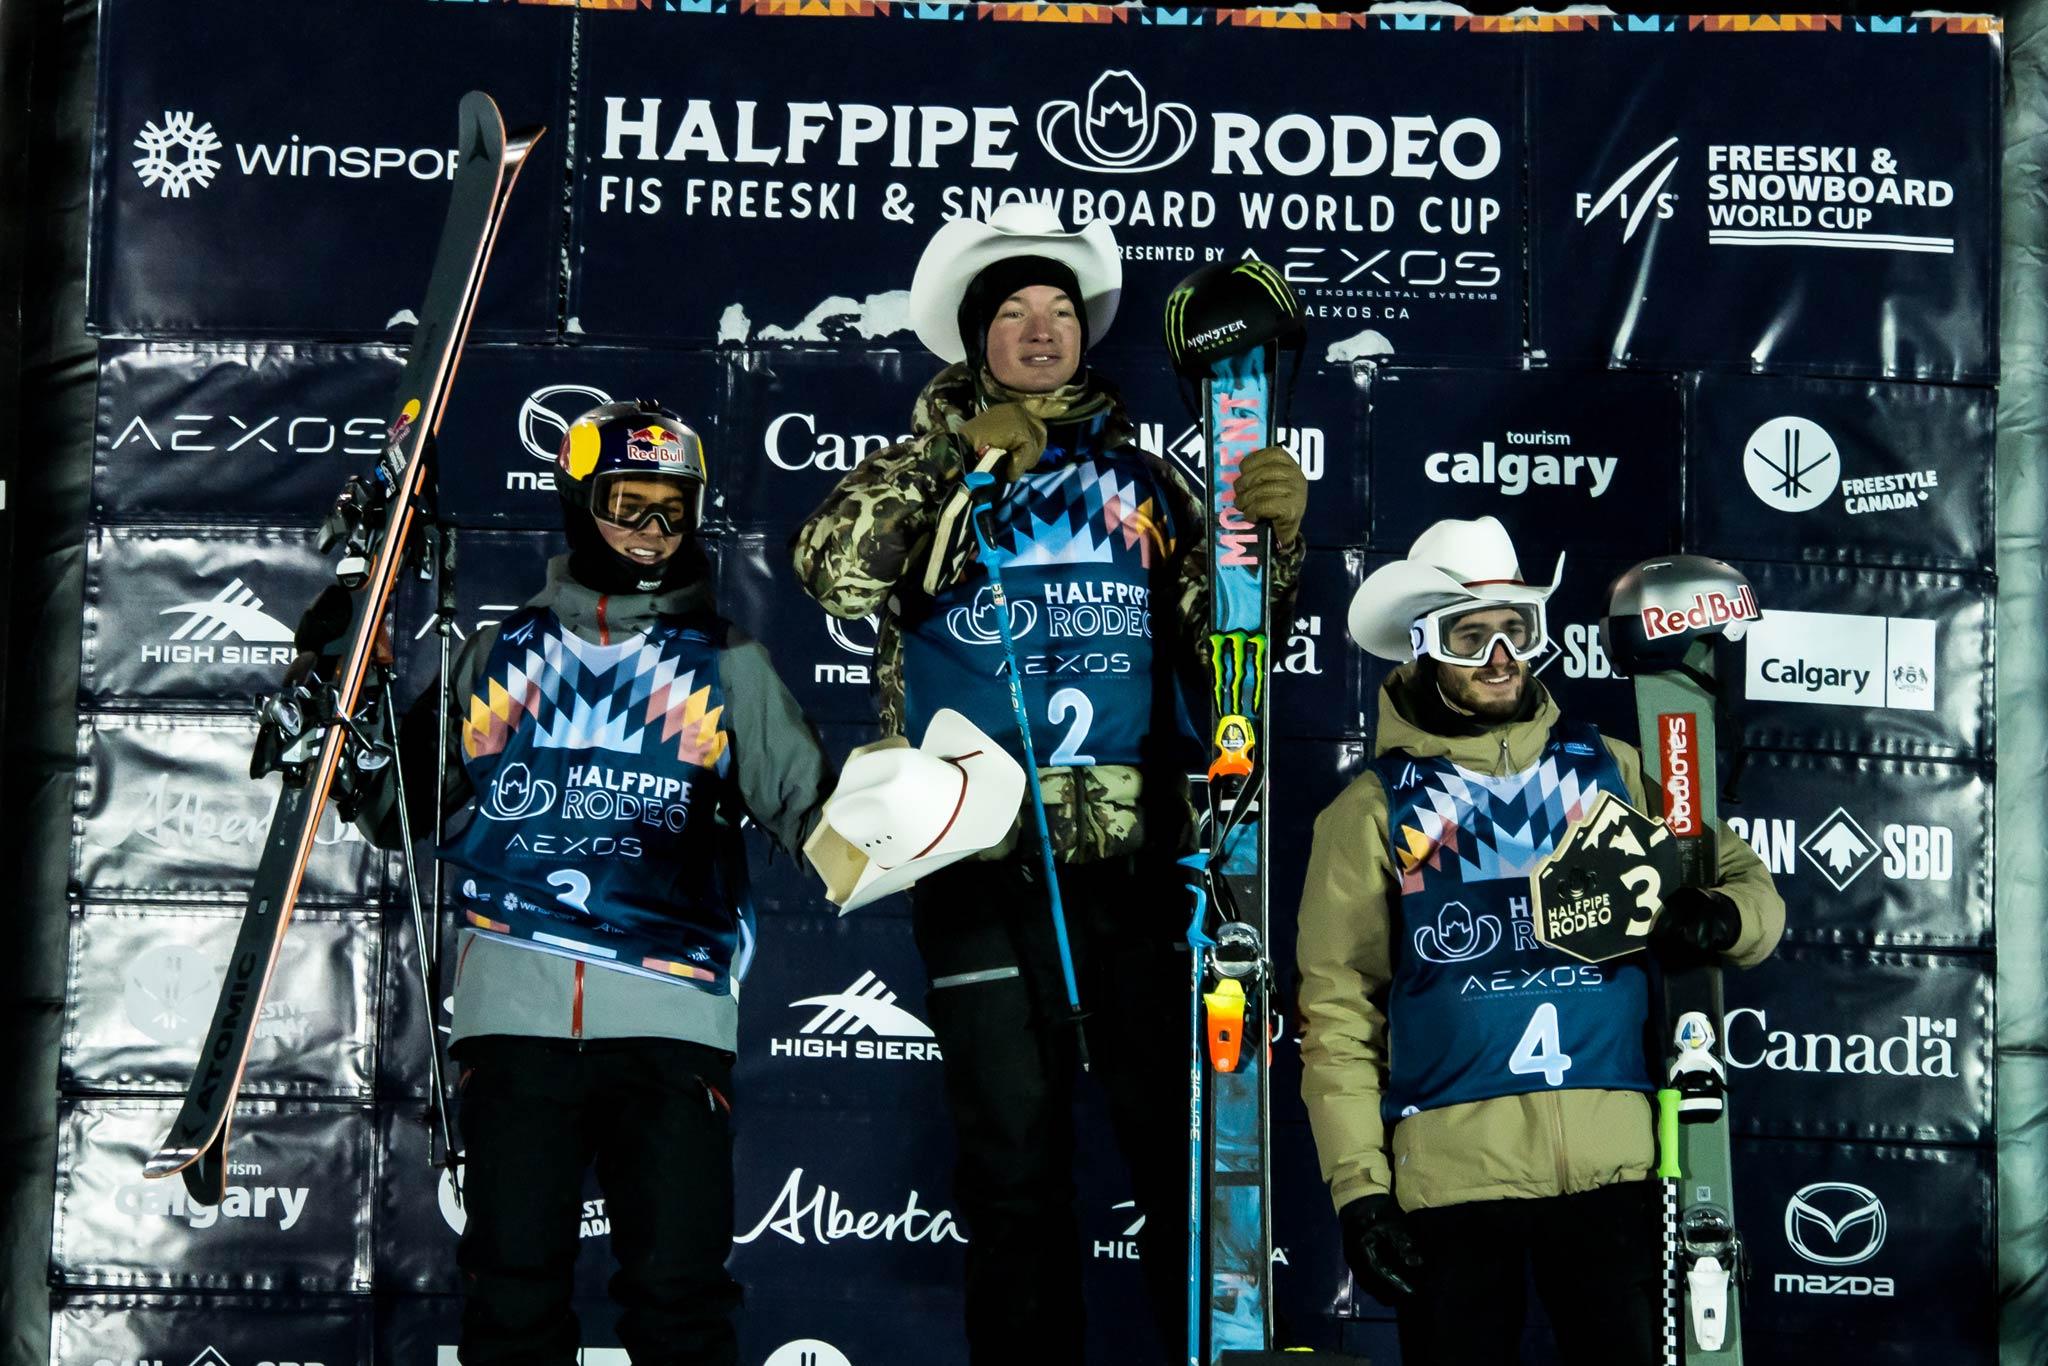 Die drei besten Männer beim FIS Freestyle Halfpipe World Cup in Calgary: Nico Porteous (NZL), David Wise (USA), Noah Bowman (CAN) - Foto: Mateusz Kielpinski / FIS